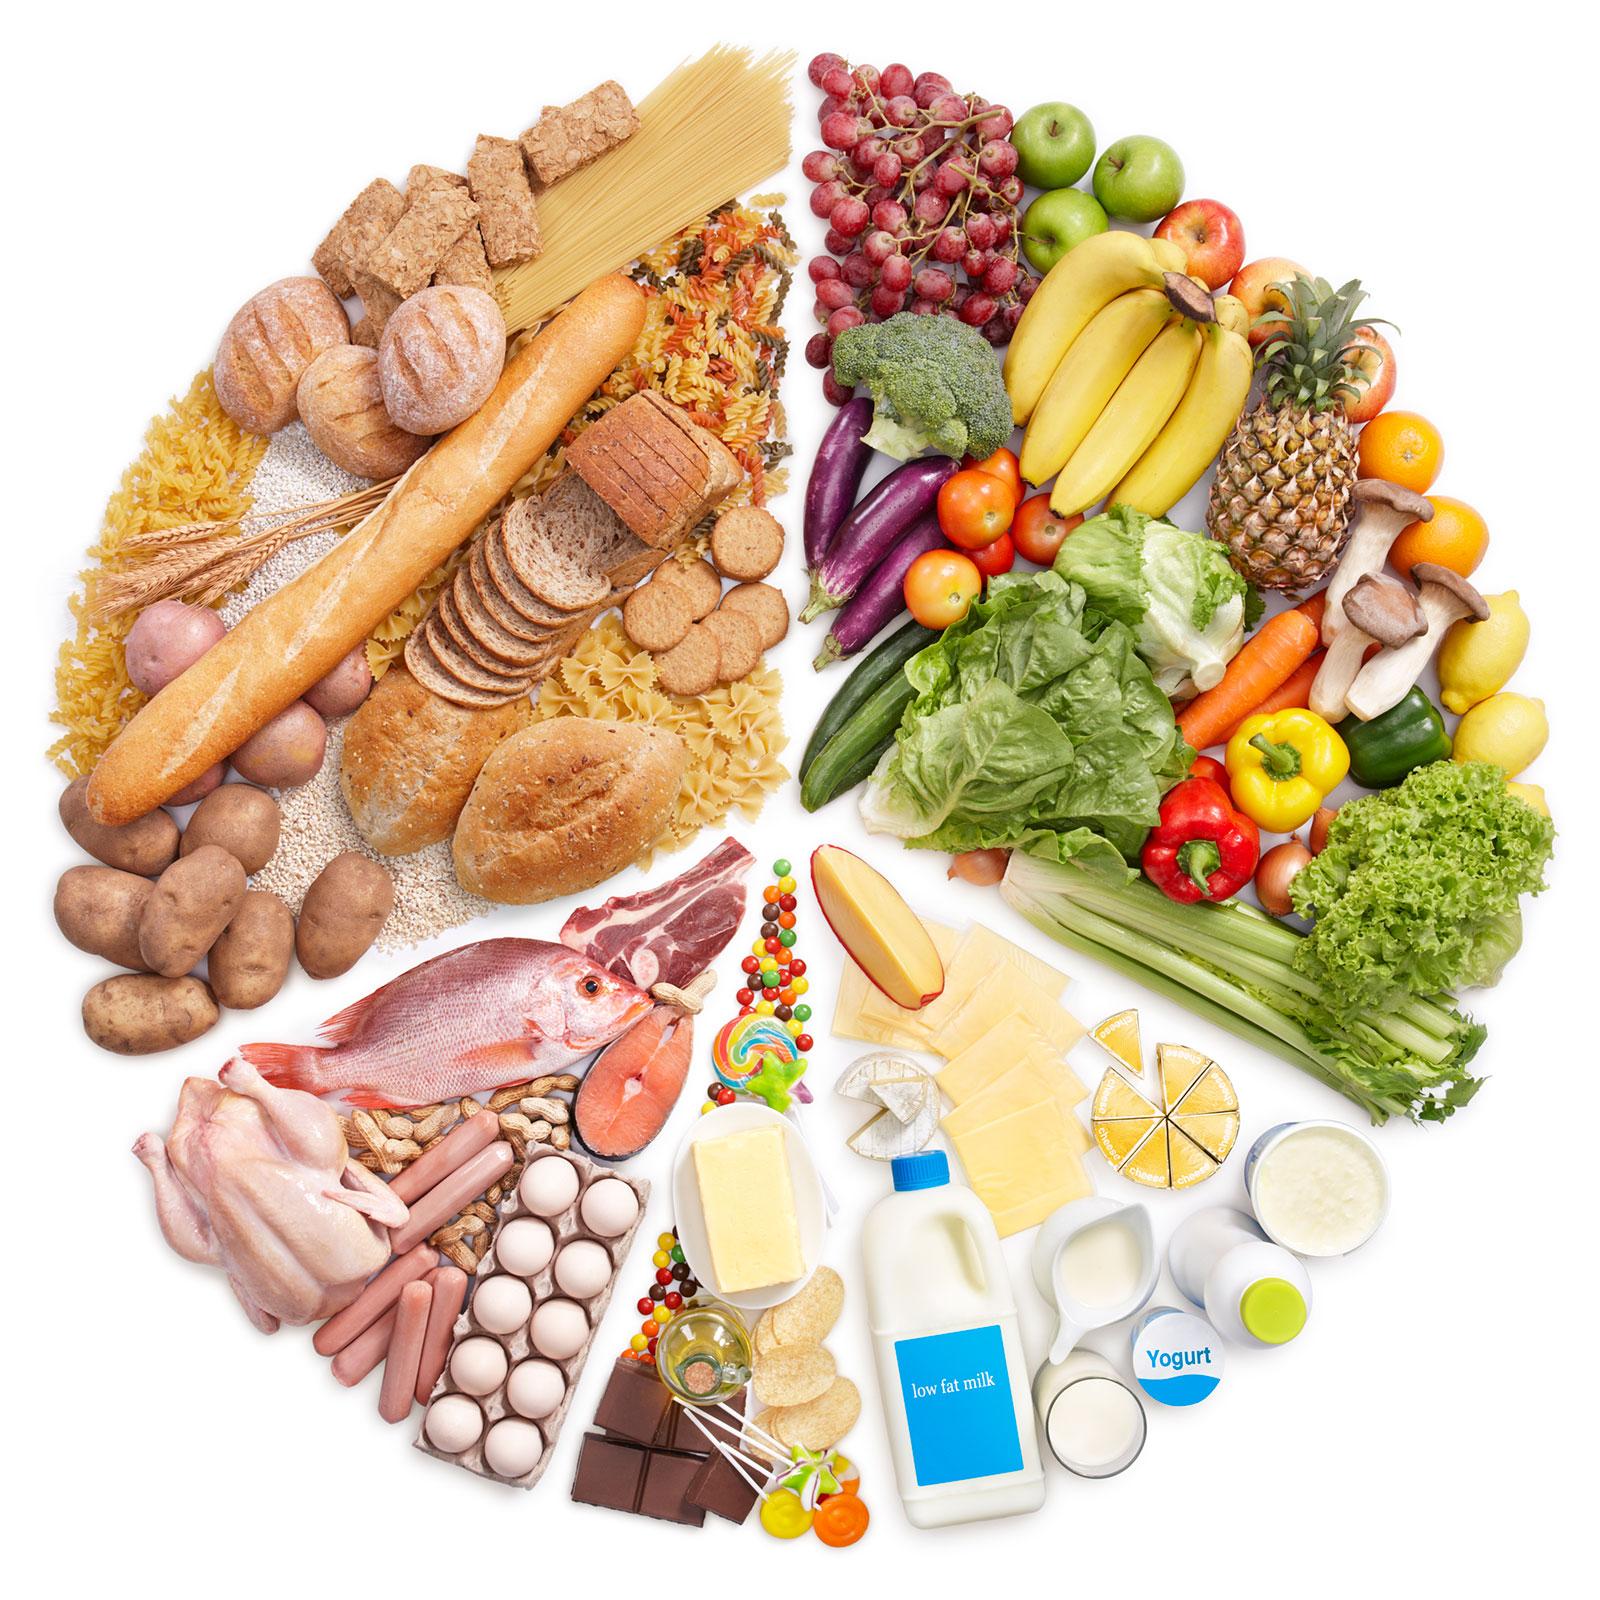 programa de dieta de proteínas de azada